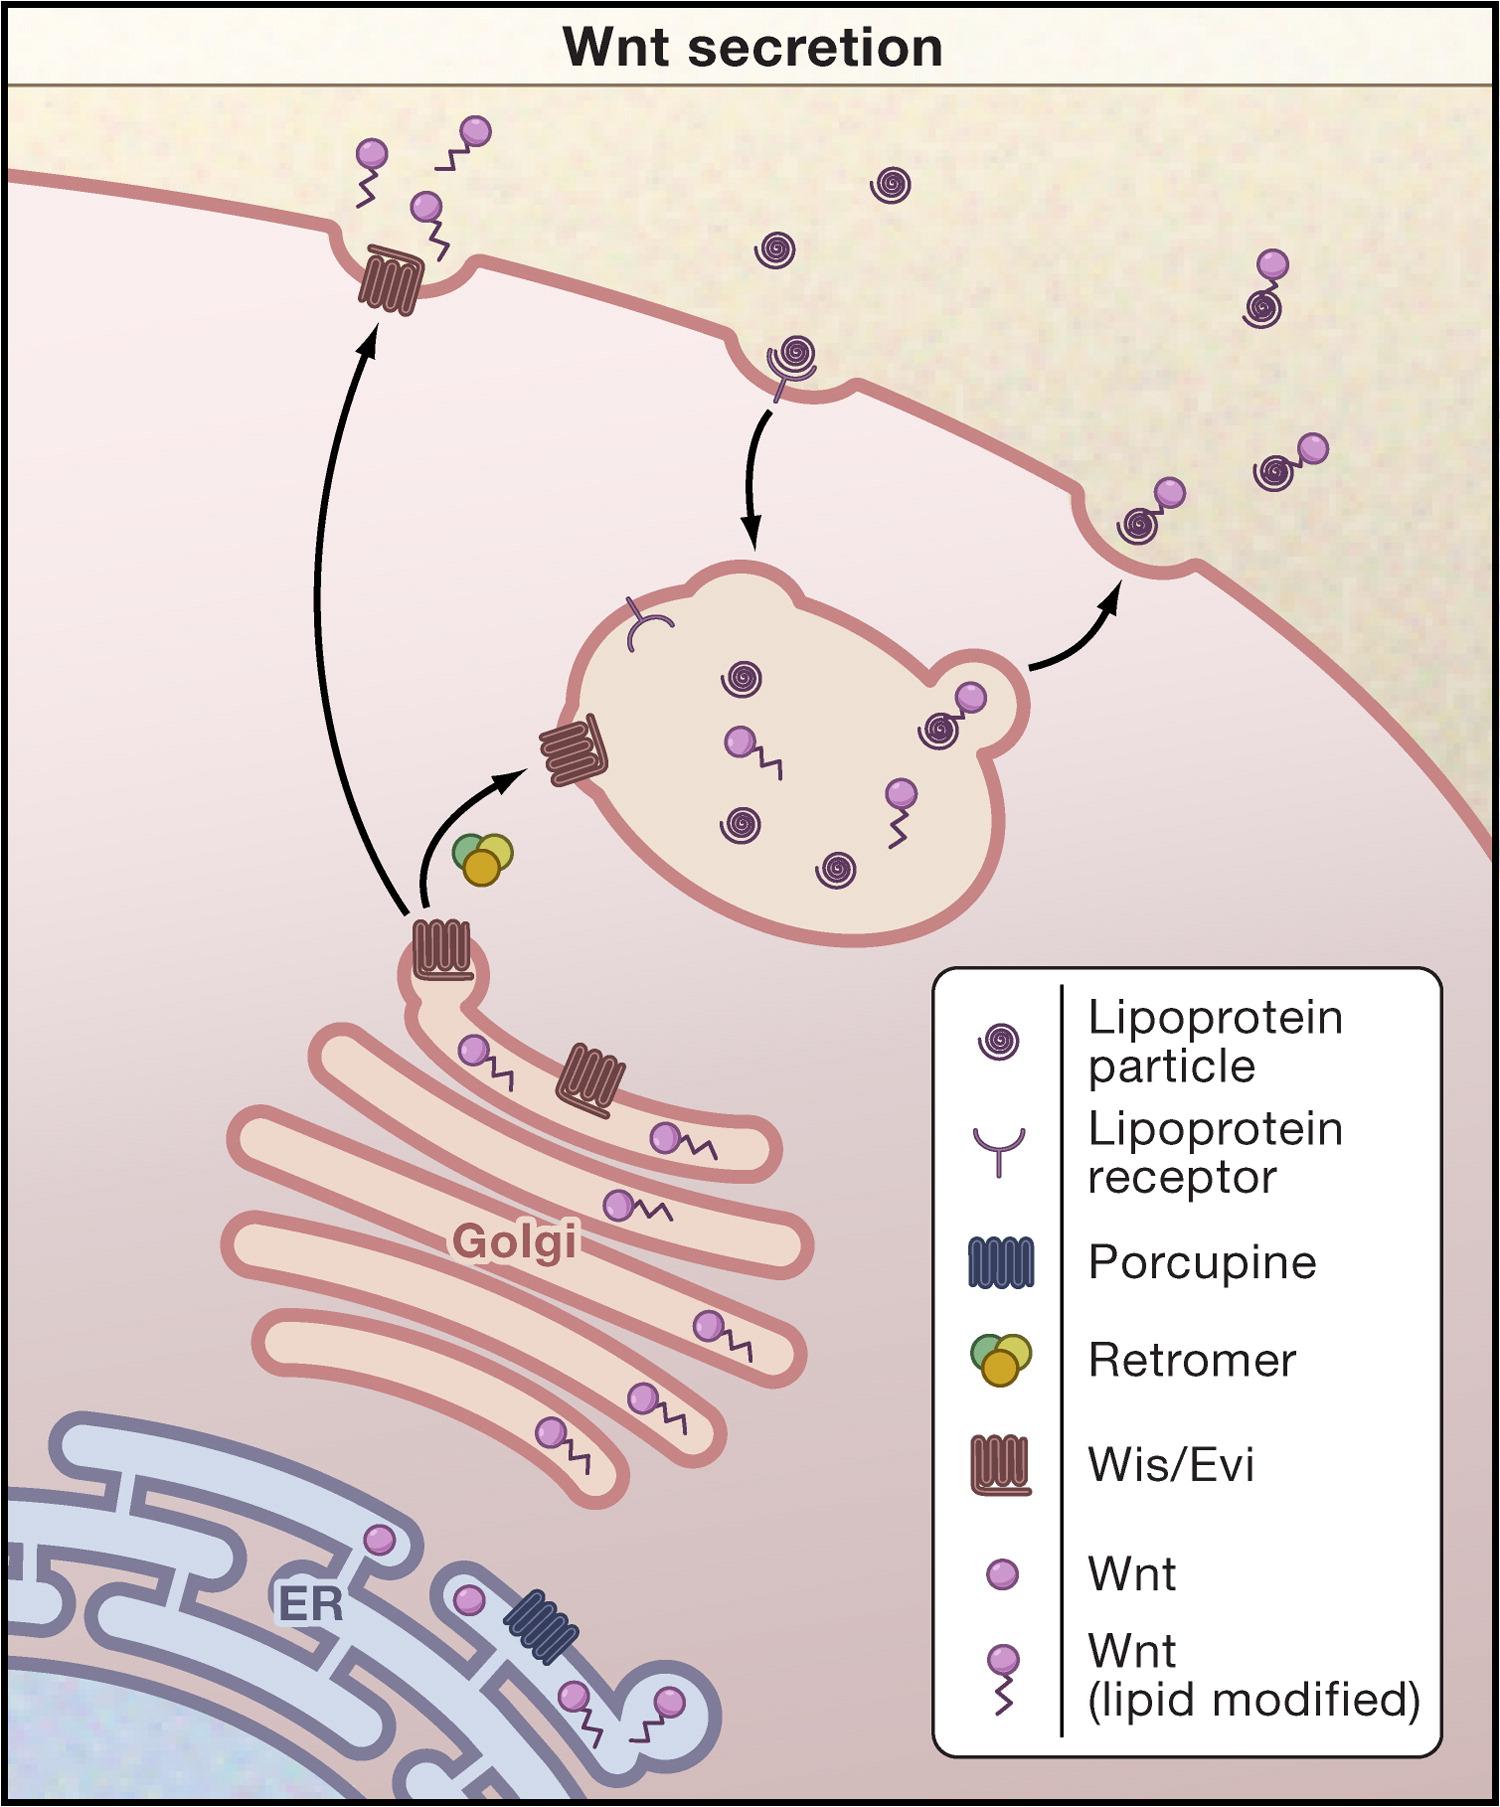 wnt-secretion